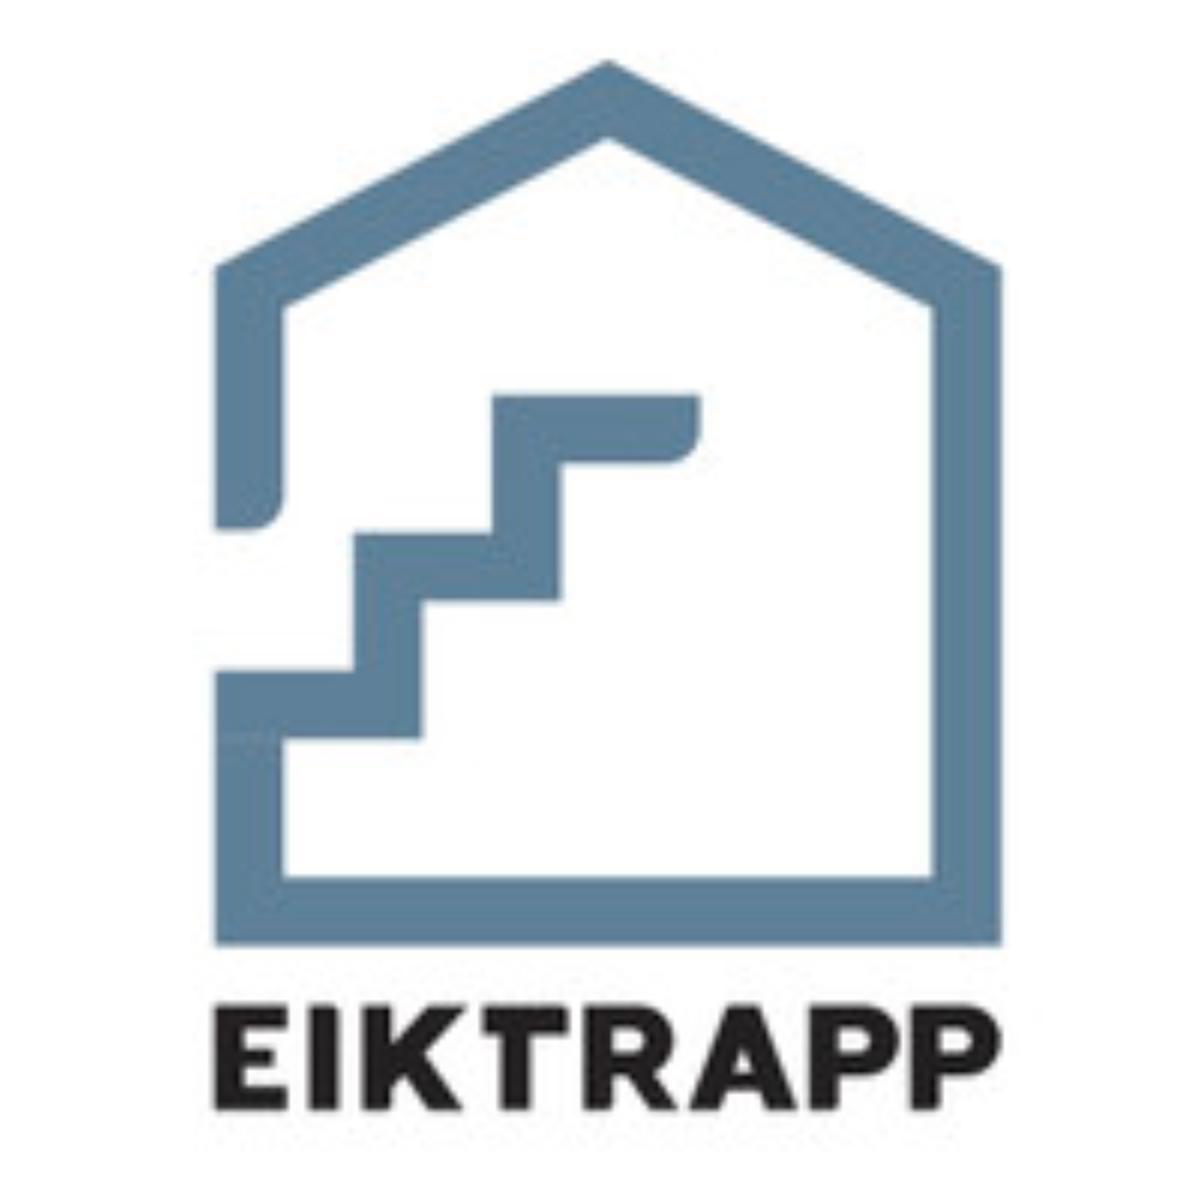 Logo - Eiktrapp.jpg